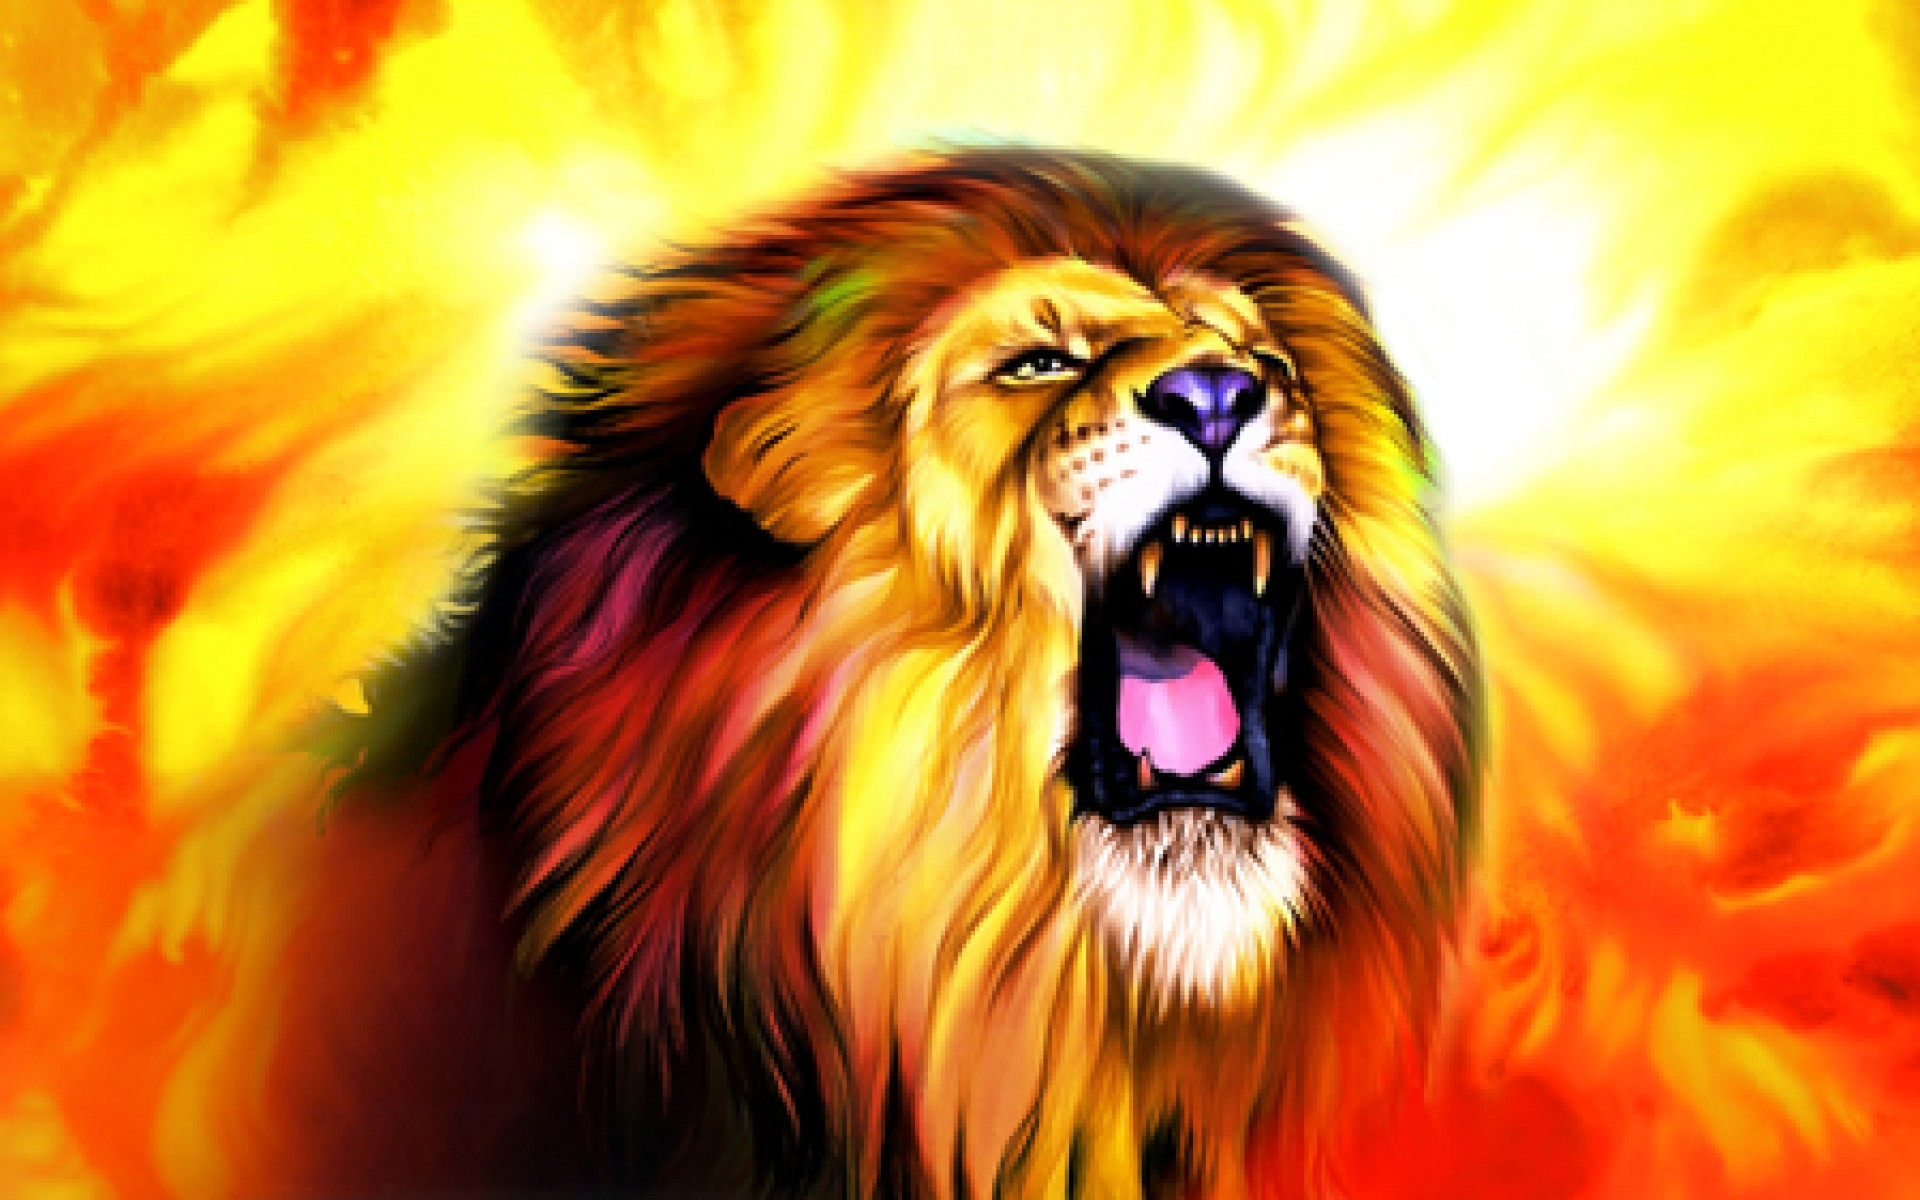 Lion Roar Wallpaper Black And White, PC Lion Roar Wallpaper Black ... for Lion Roaring Gif  11lplpg